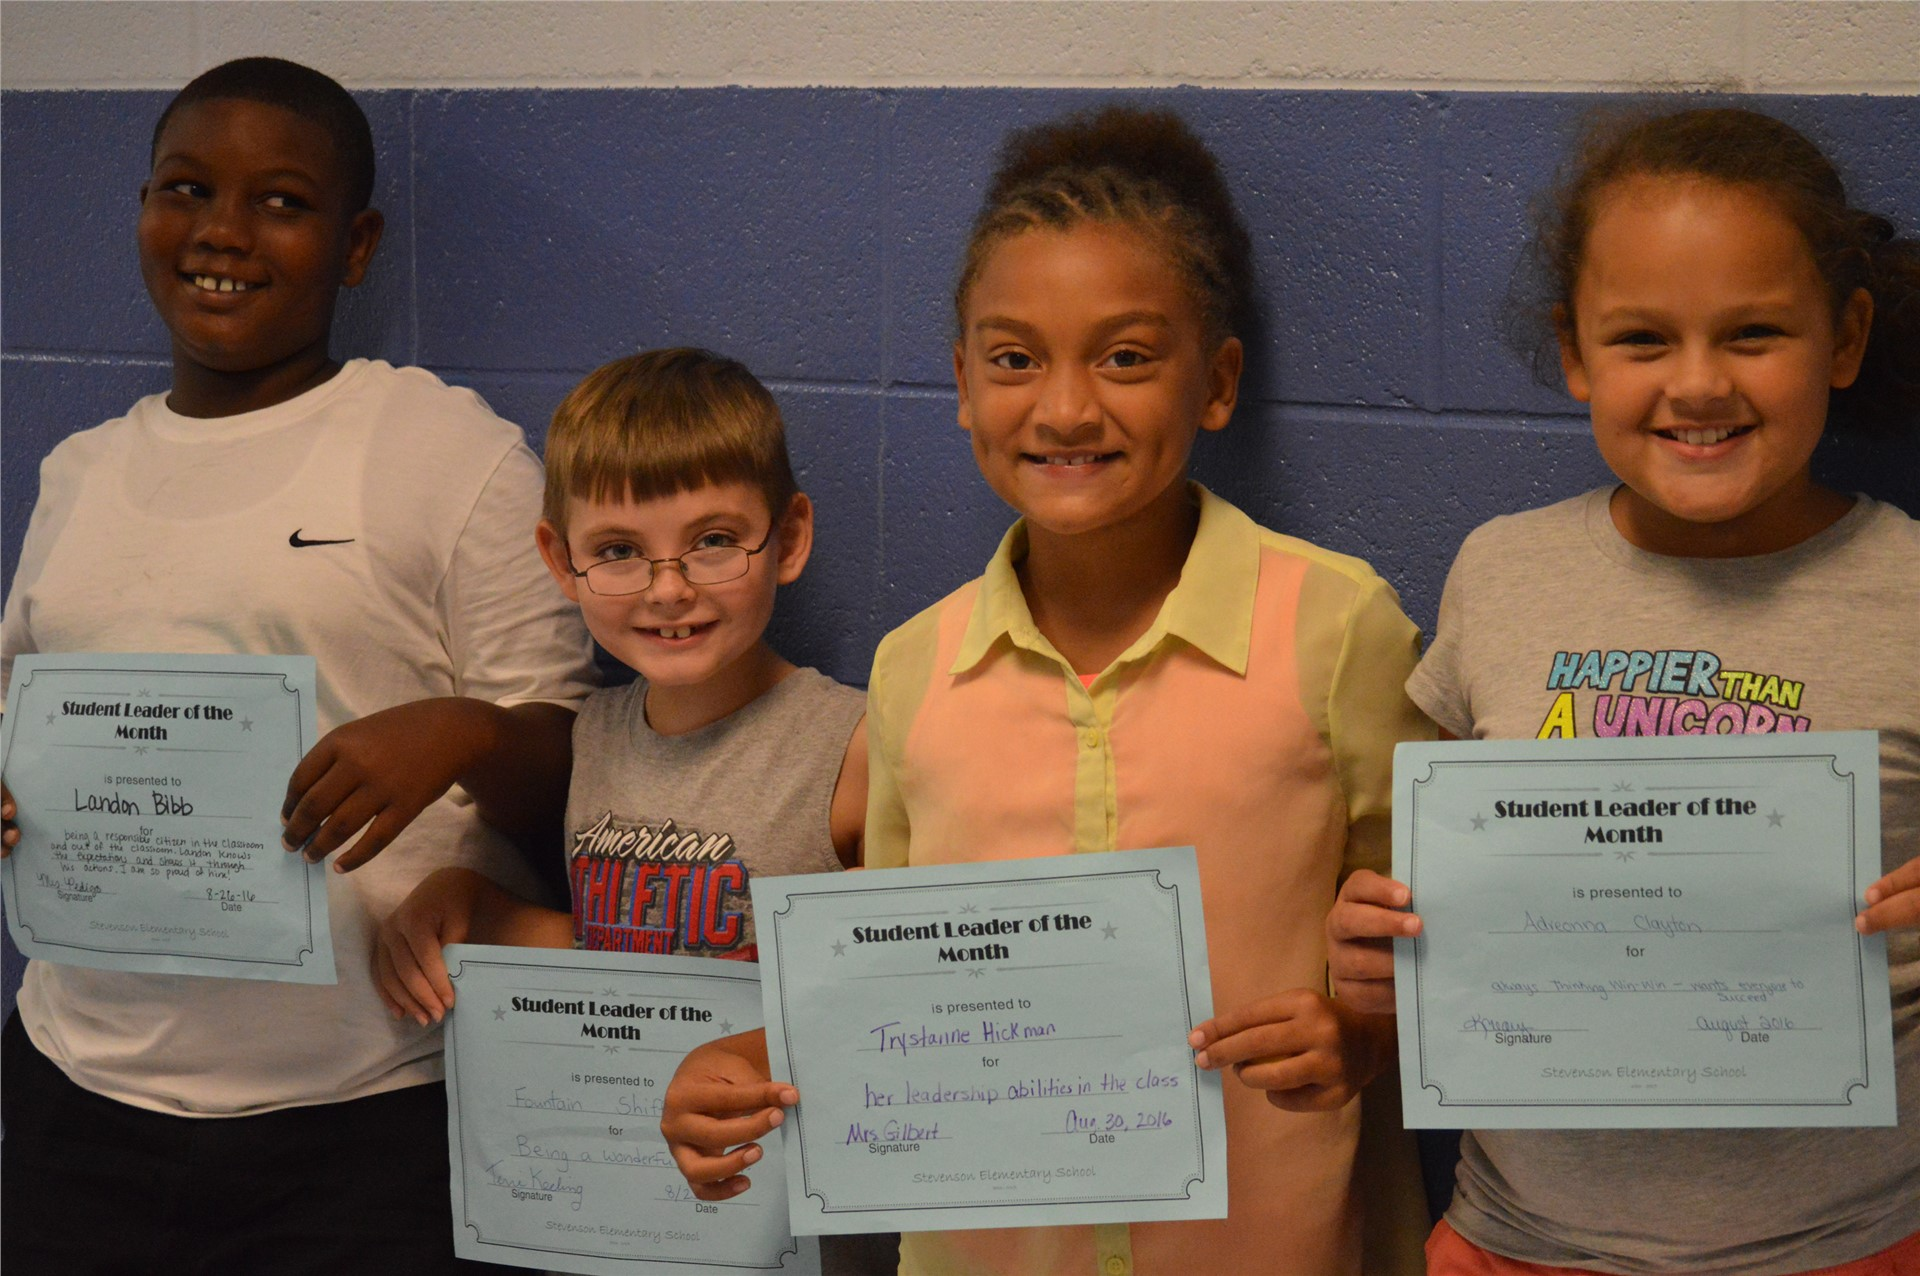 Landon Bibb, Fountain Shifflett, IV, Trystanne Hickman, Adreonna Clayton, 3rd Grade